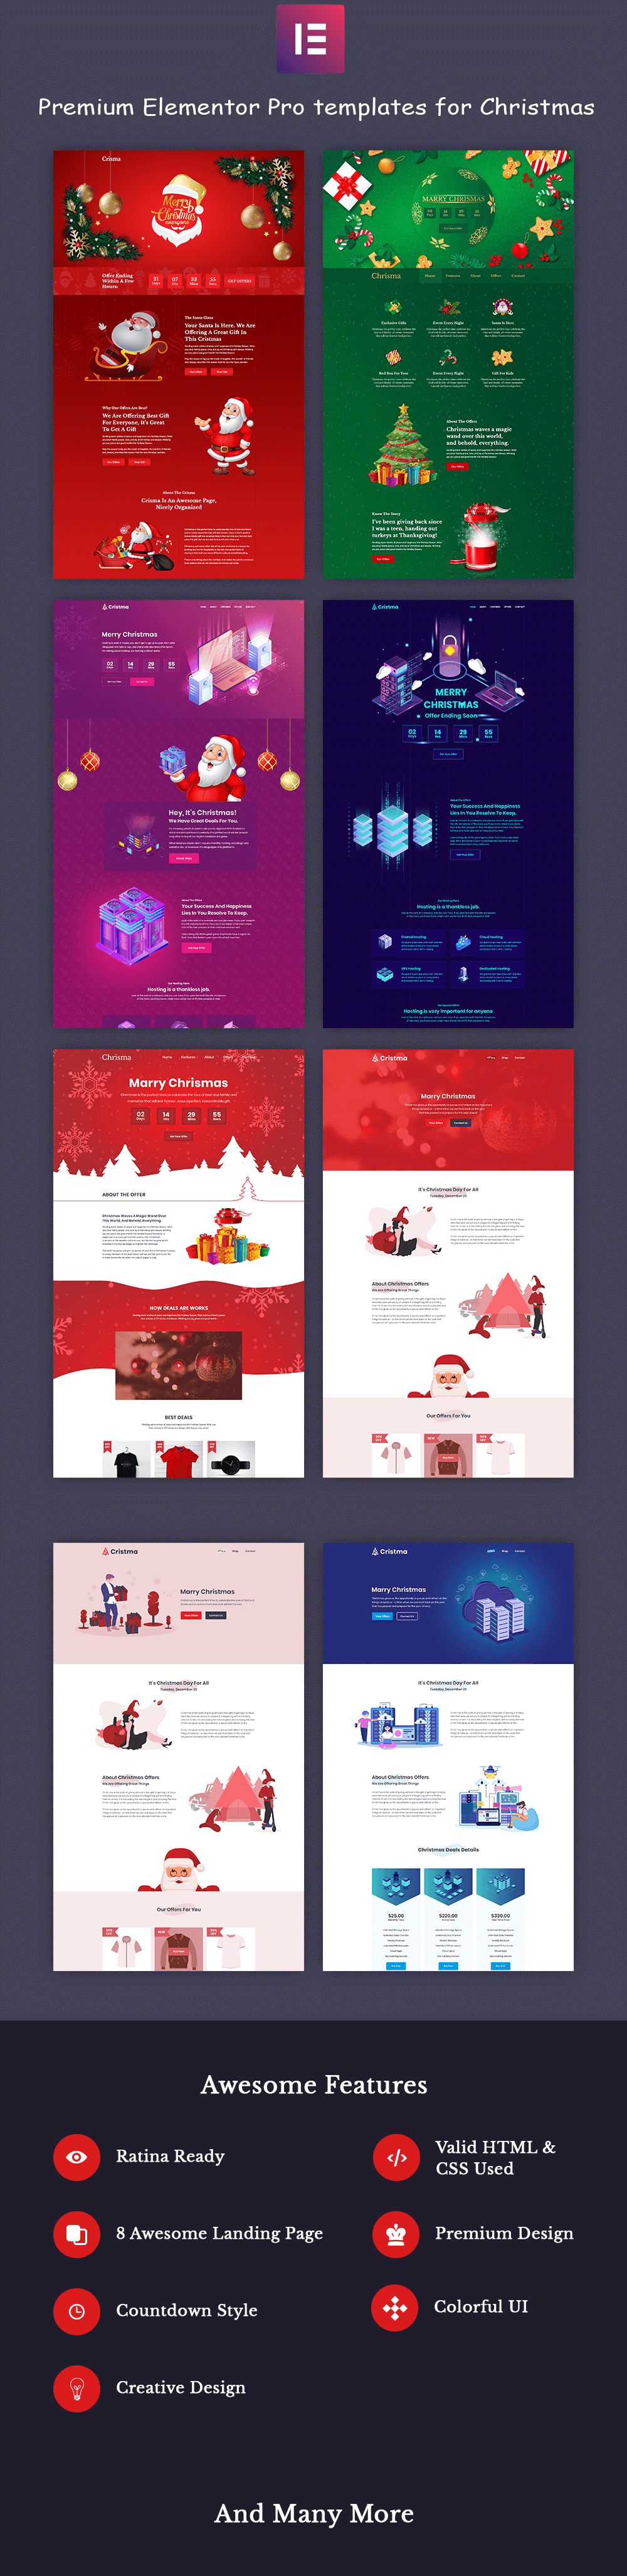 Elementor Christmas template